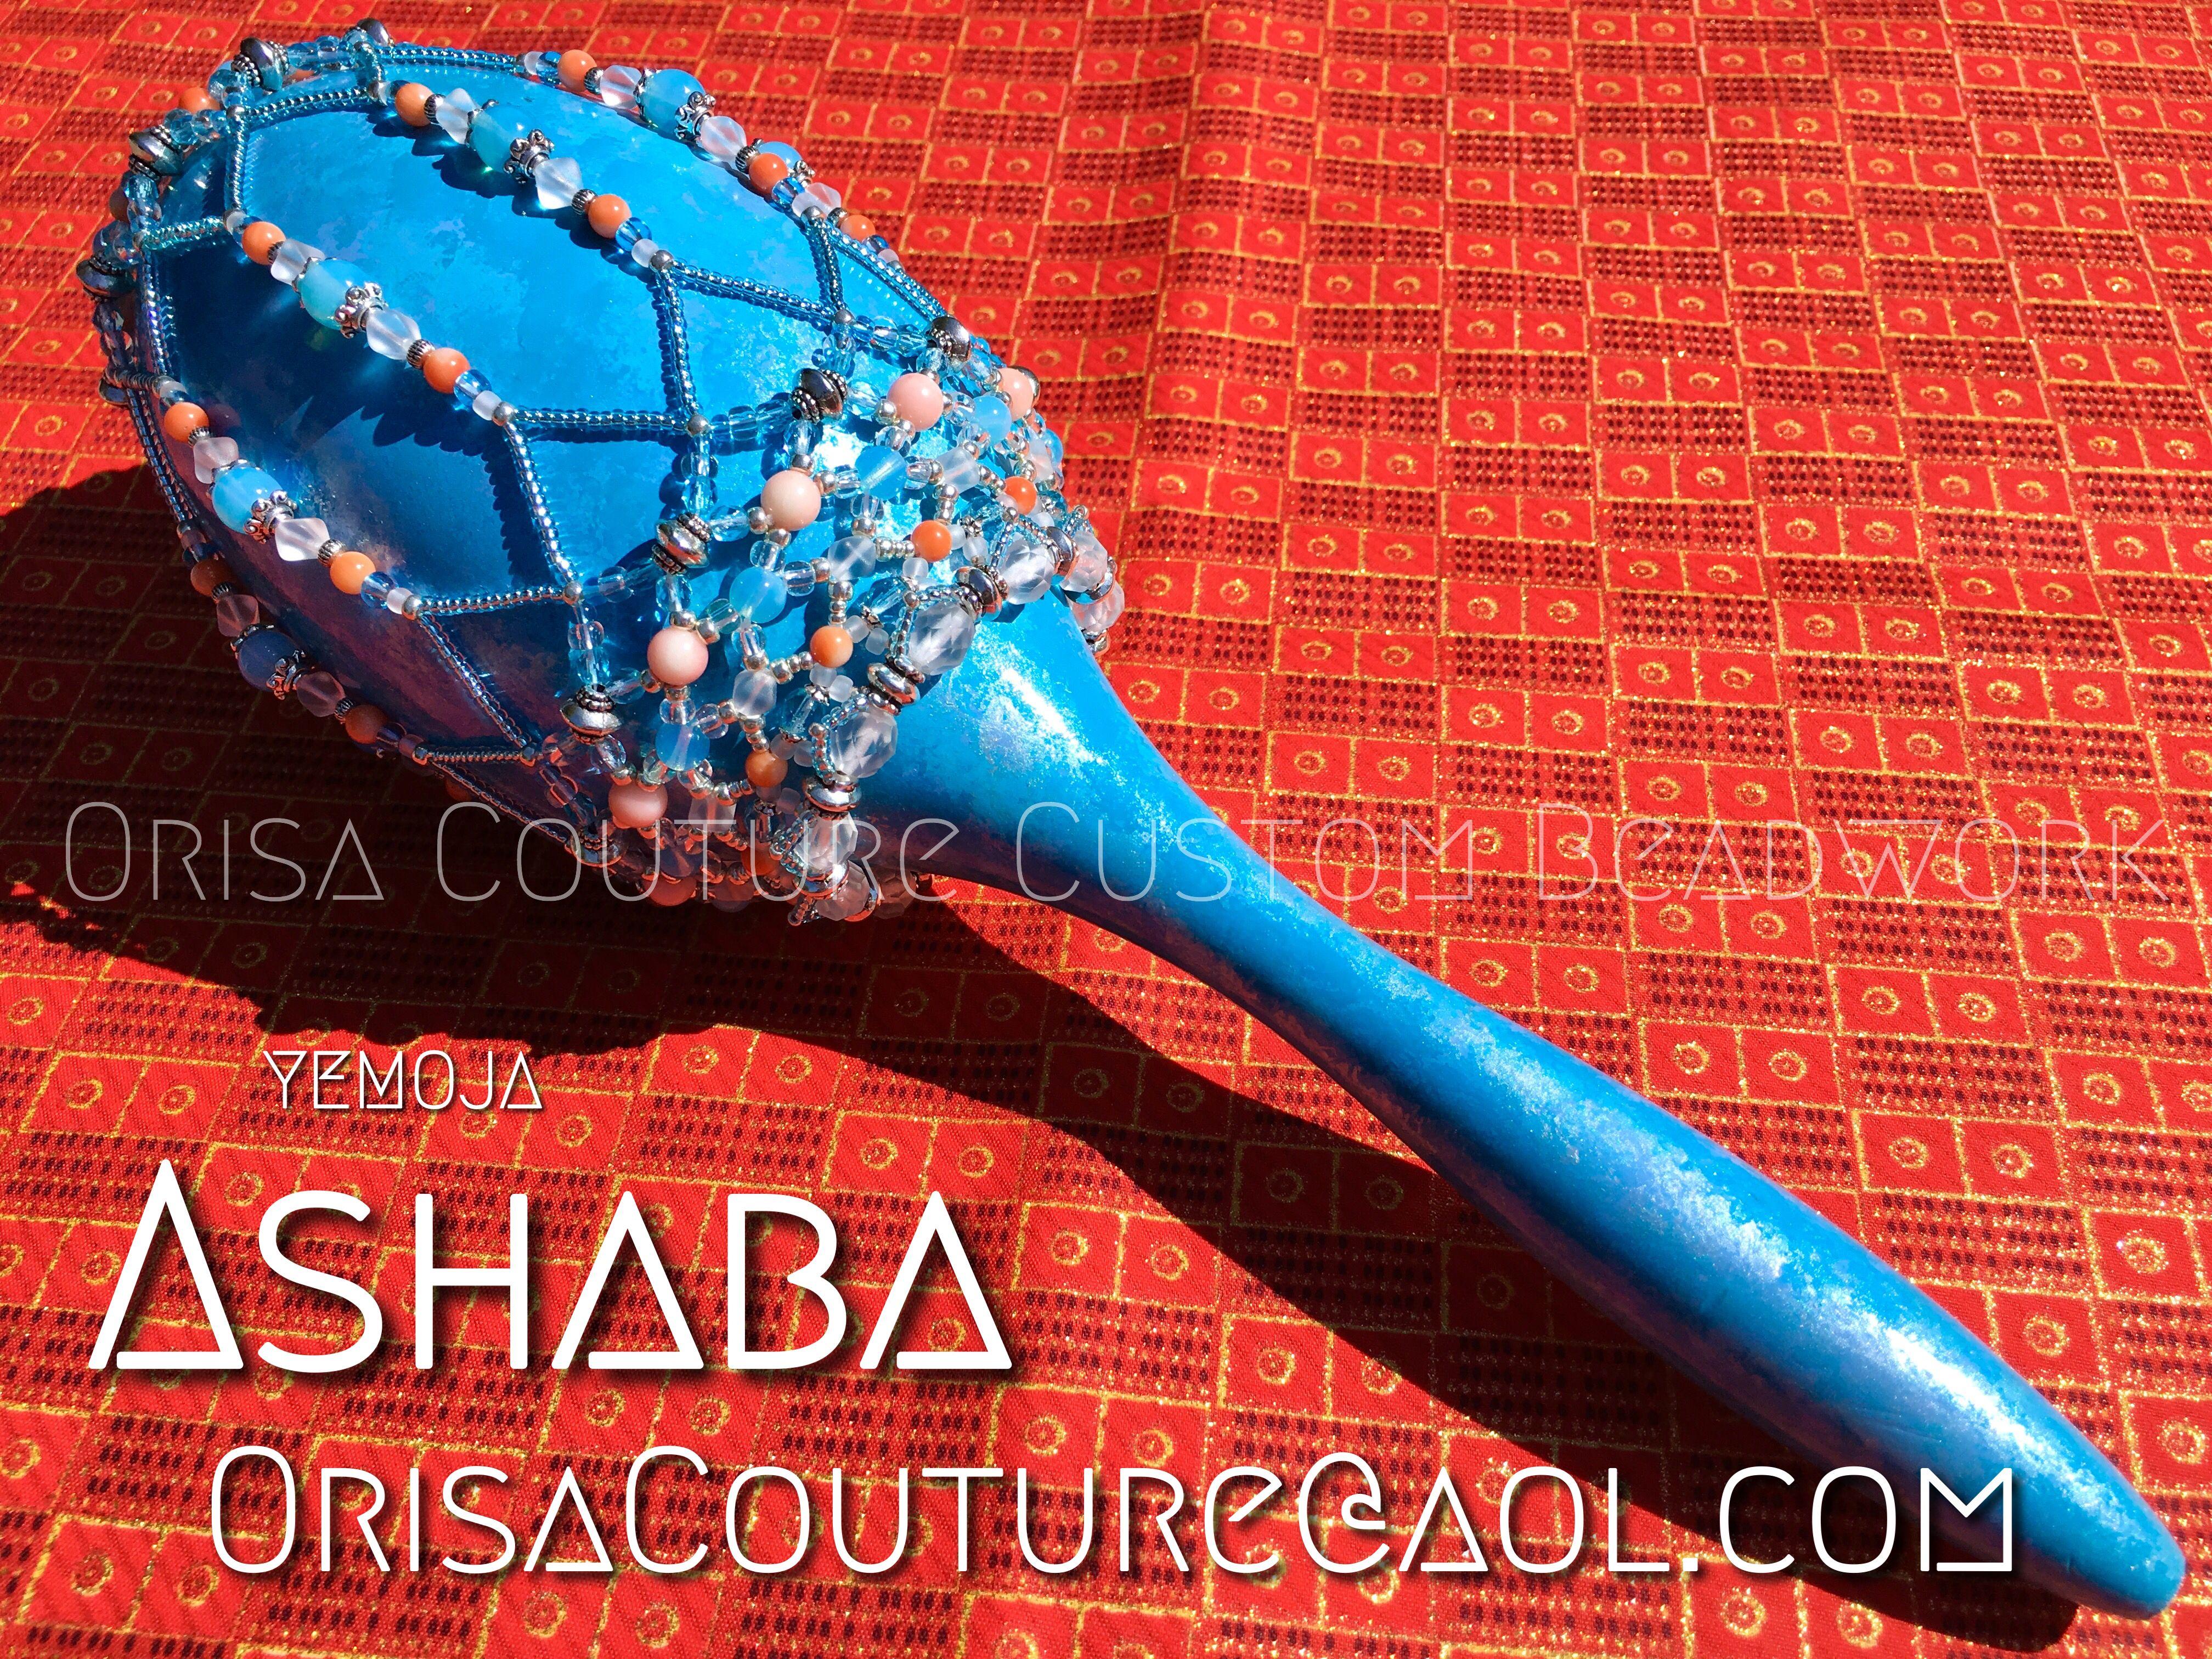 Ashere Yemoja Ashaba For Inquires Please Send An Email To Orisacouture Aol Com Ashere Asere Yemoja Yemaya Ashaba Asaba Orisa Orisha Lukumi Santeria